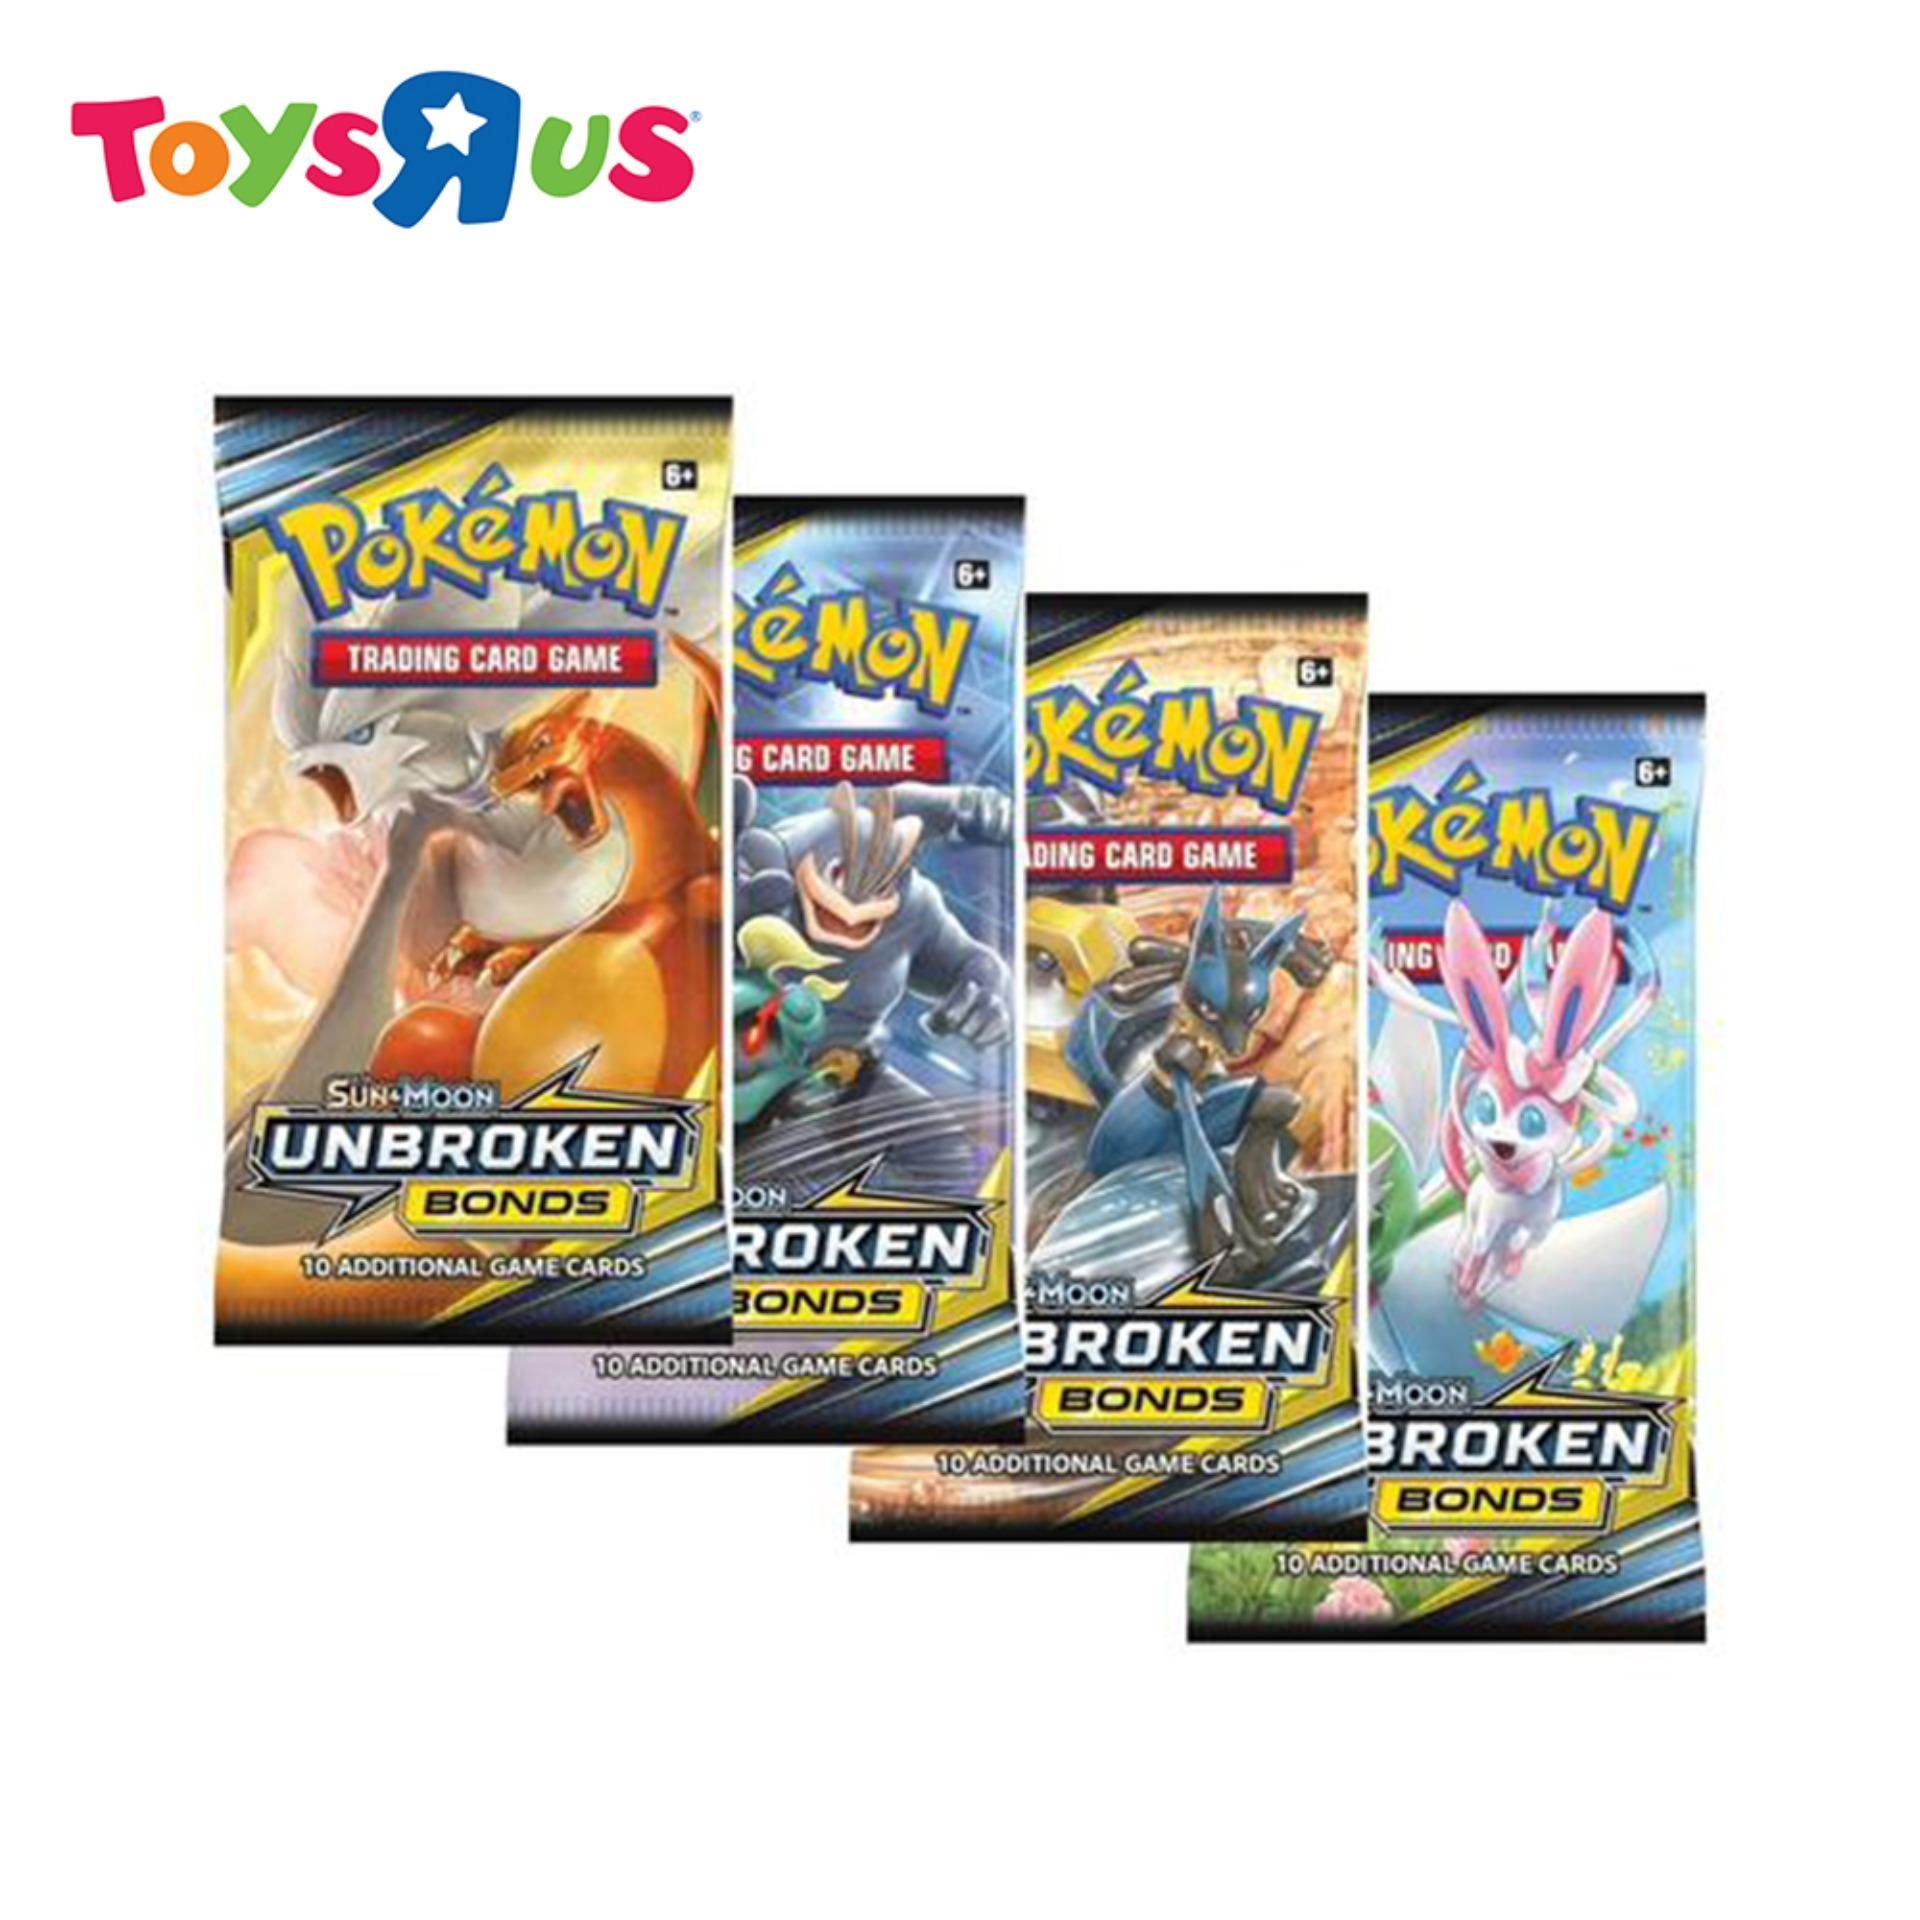 Pokemon Philippines: Pokemon price list - Pokeball, Pokemon Cards